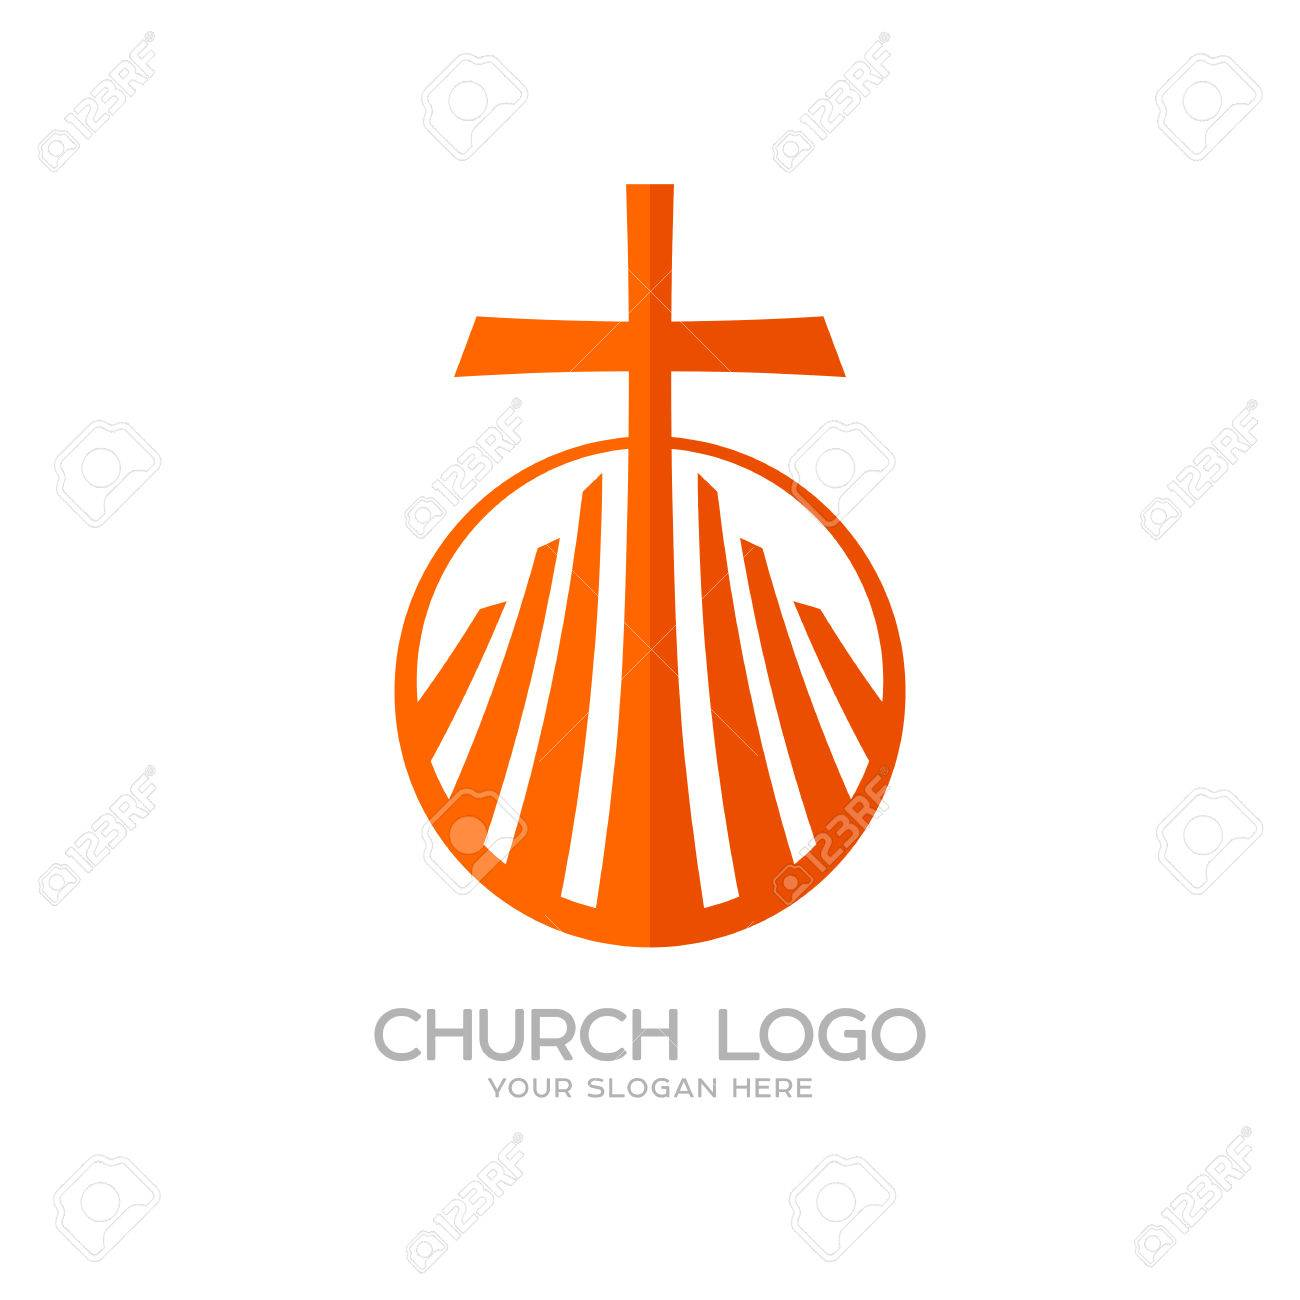 Church logo christian symbols the cross of jesus and the graphic christian symbols the cross of jesus and the graphic elements stock vector buycottarizona